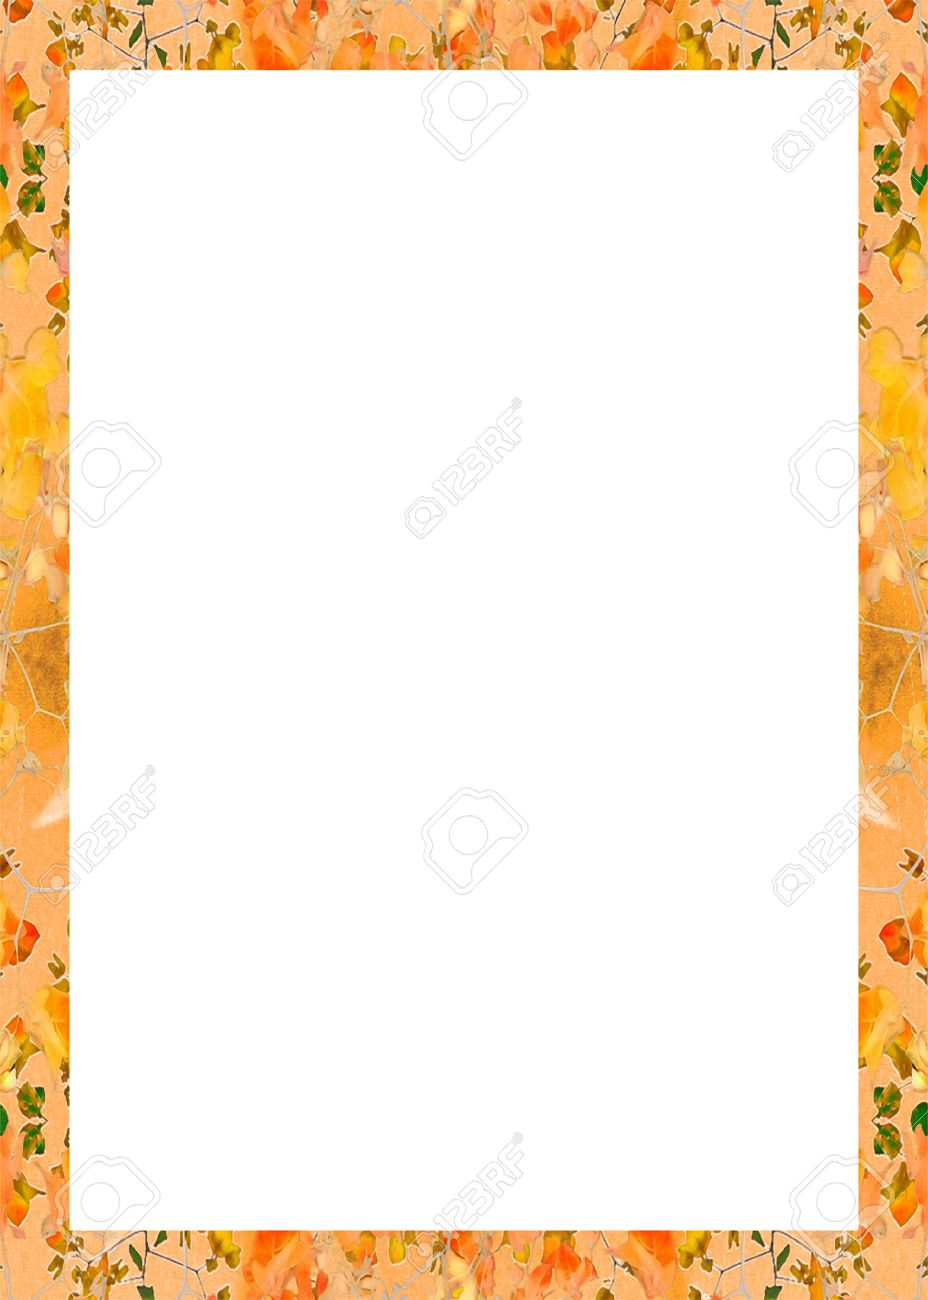 Ornament Portrait Format Frame Background With Elegant Decorative